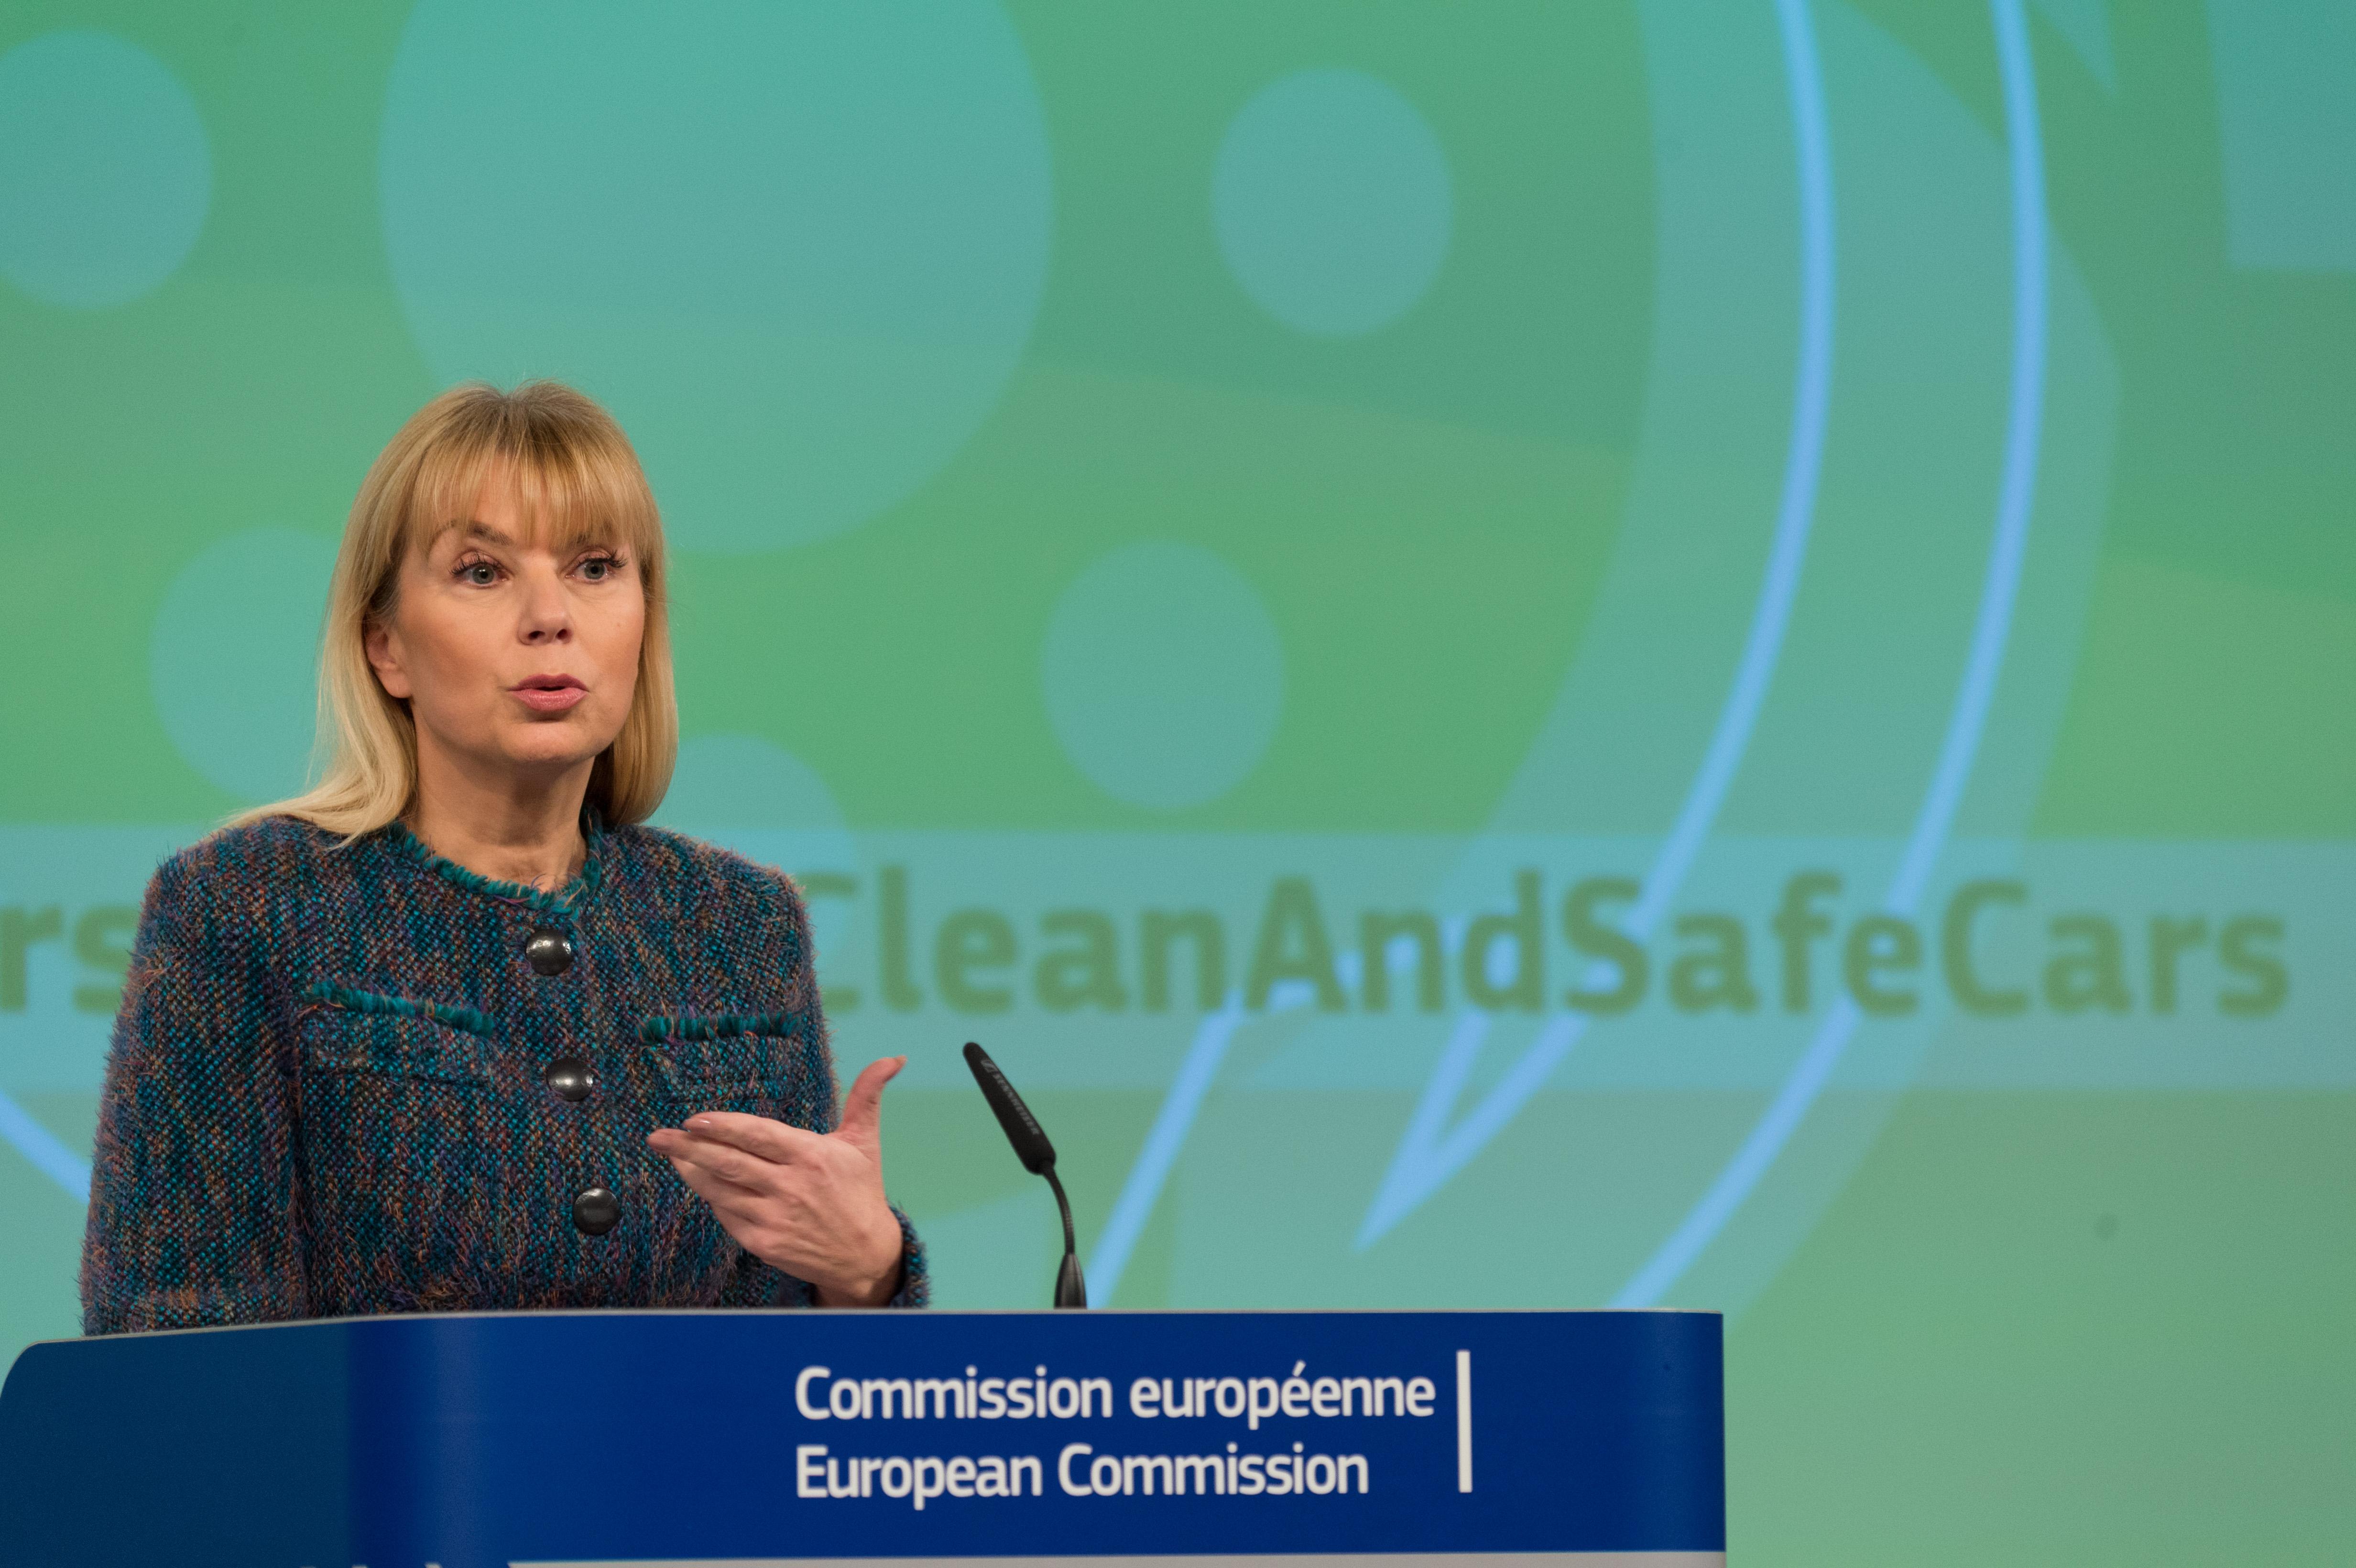 EU Internal Market Commissioner Elzbieta Bienkowska